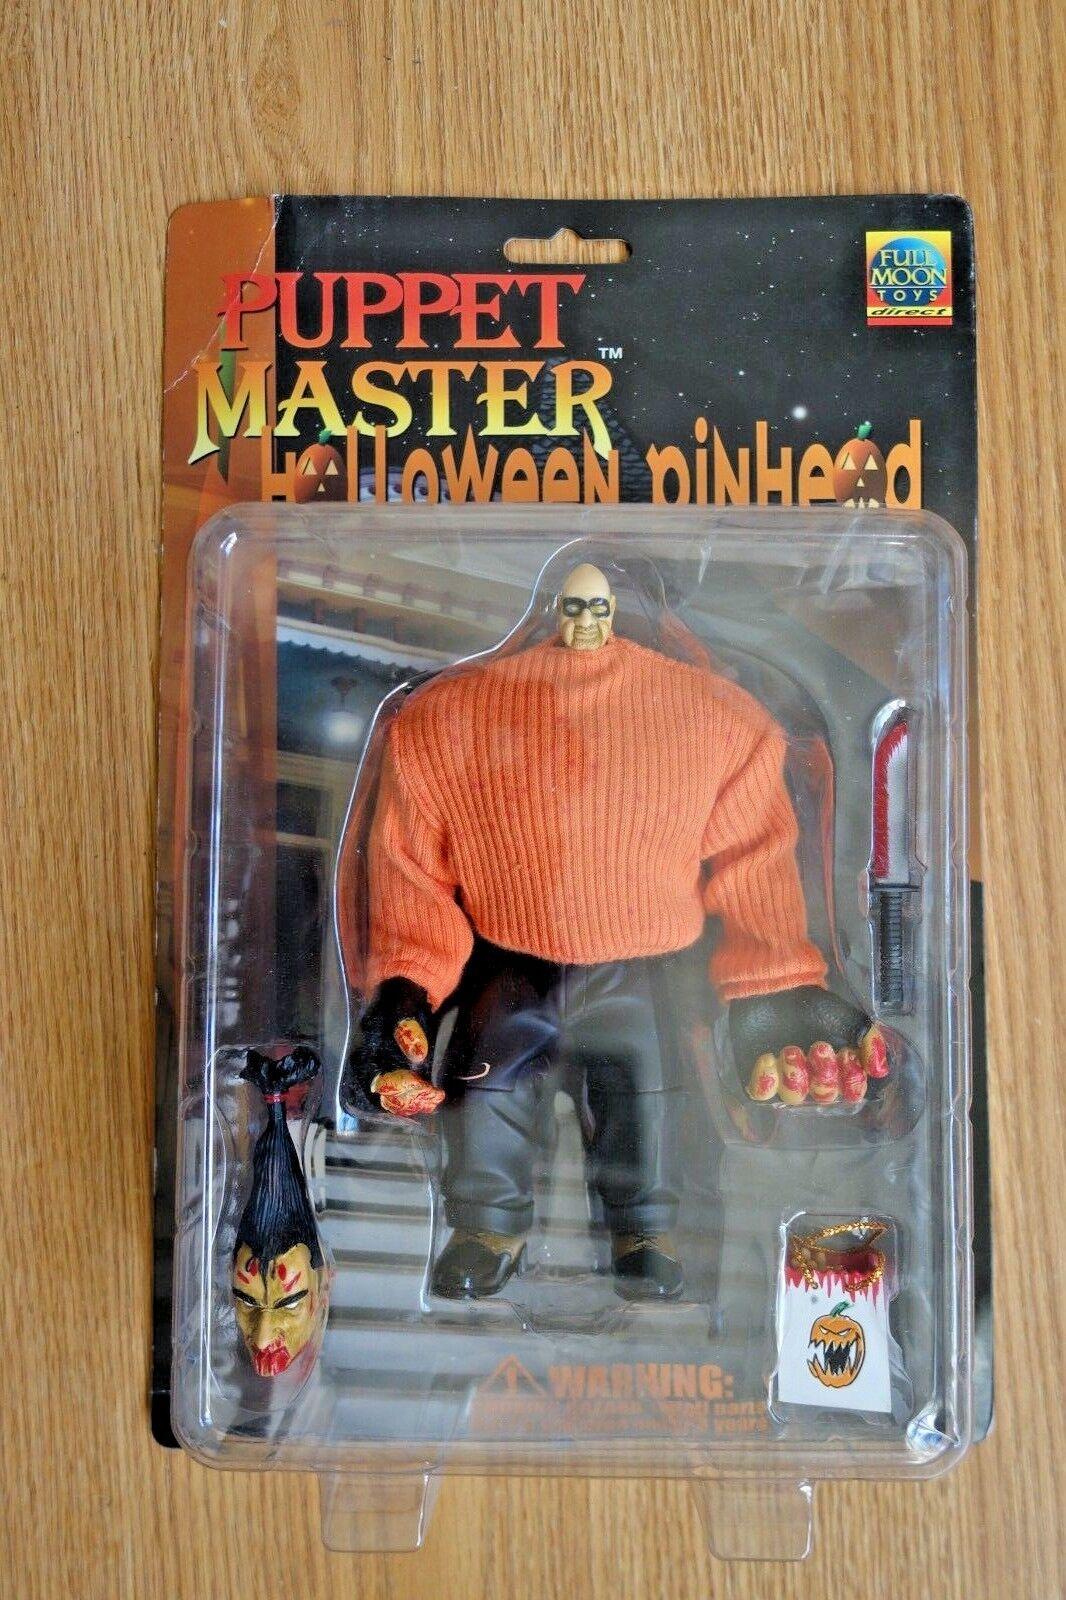 1999 Full Moon Puppet Master Special Edition Halloween Pinhead Figure